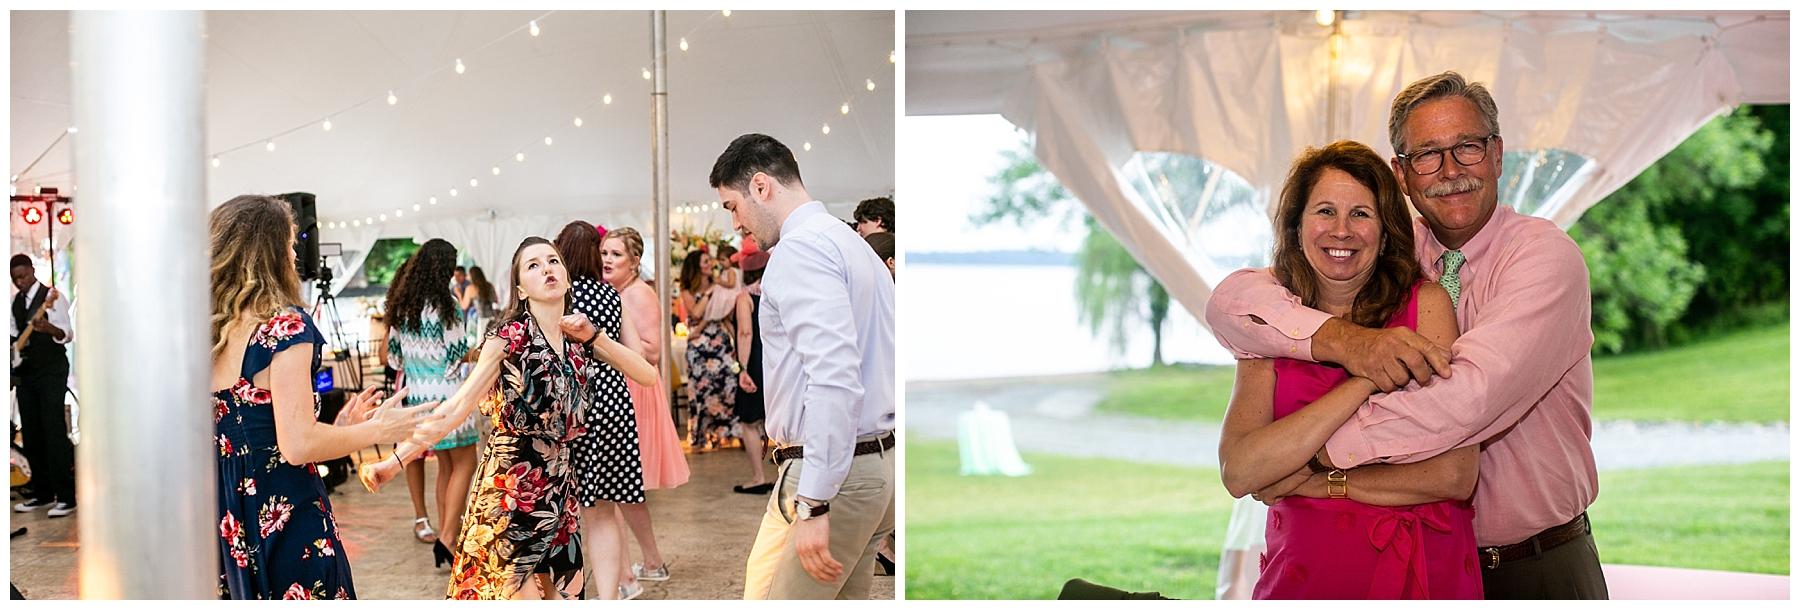 Chelsea Phil Bohemia River Overlook Wedding Living Radiant Photography photos_0189.jpg